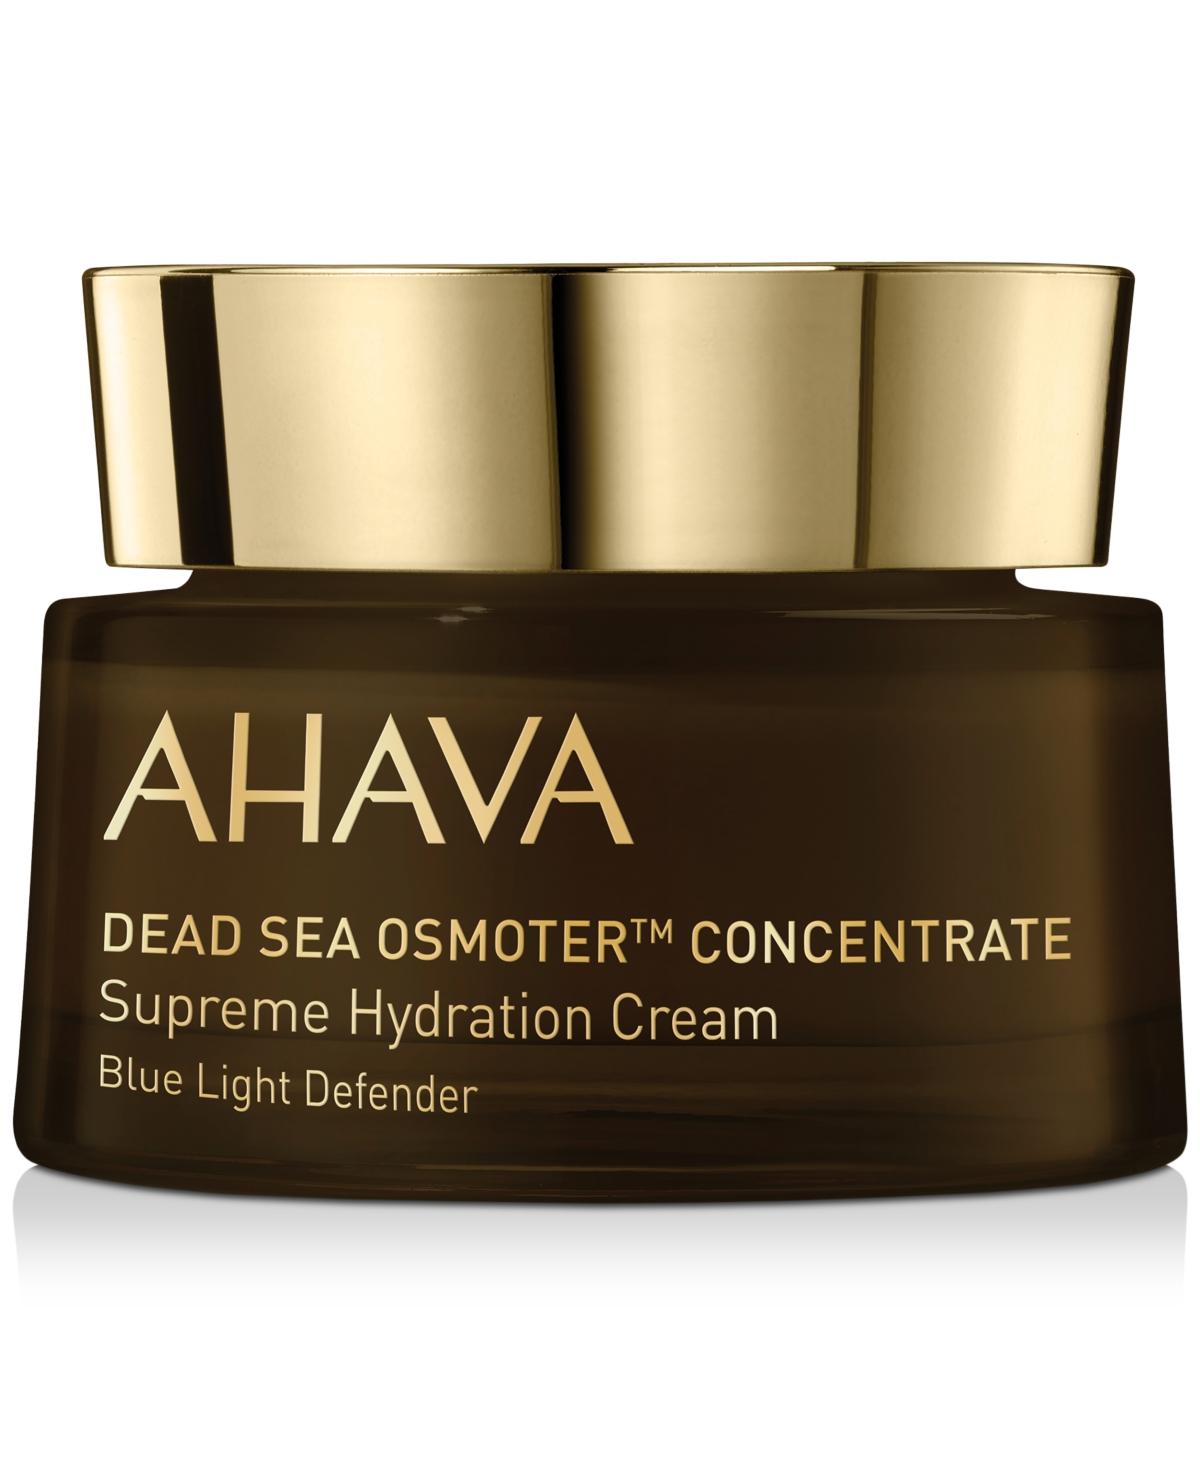 Ahava Dead Sea Osmoter Concentrate Supreme Hydration Cream Blue Light Defender, 1.7-oz.